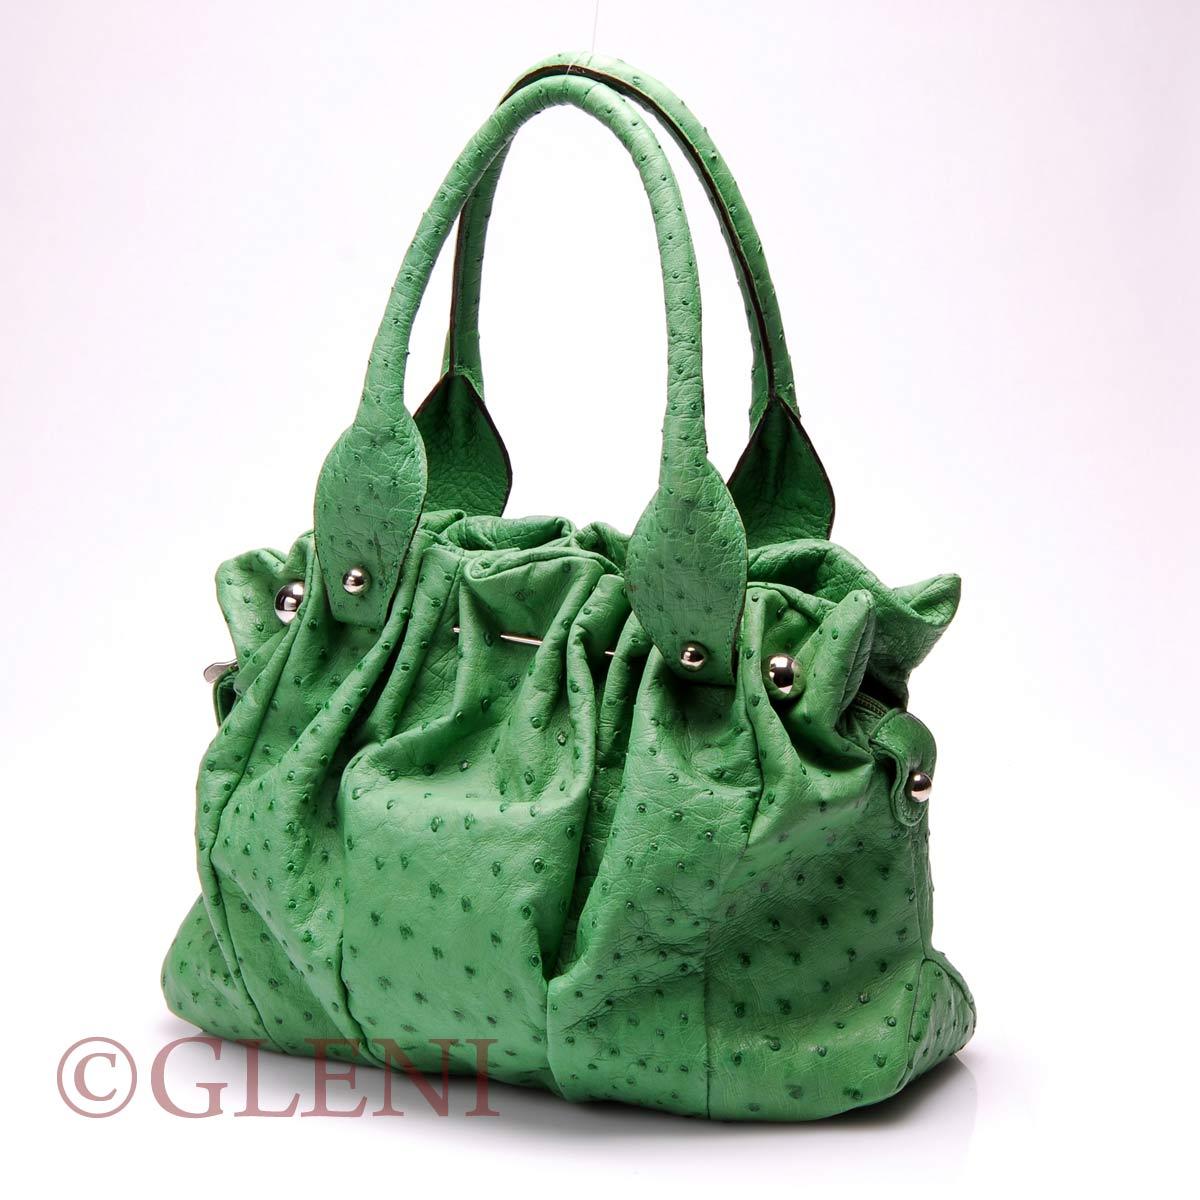 ad132083dc77 Luxury handbag in green ostrich leather